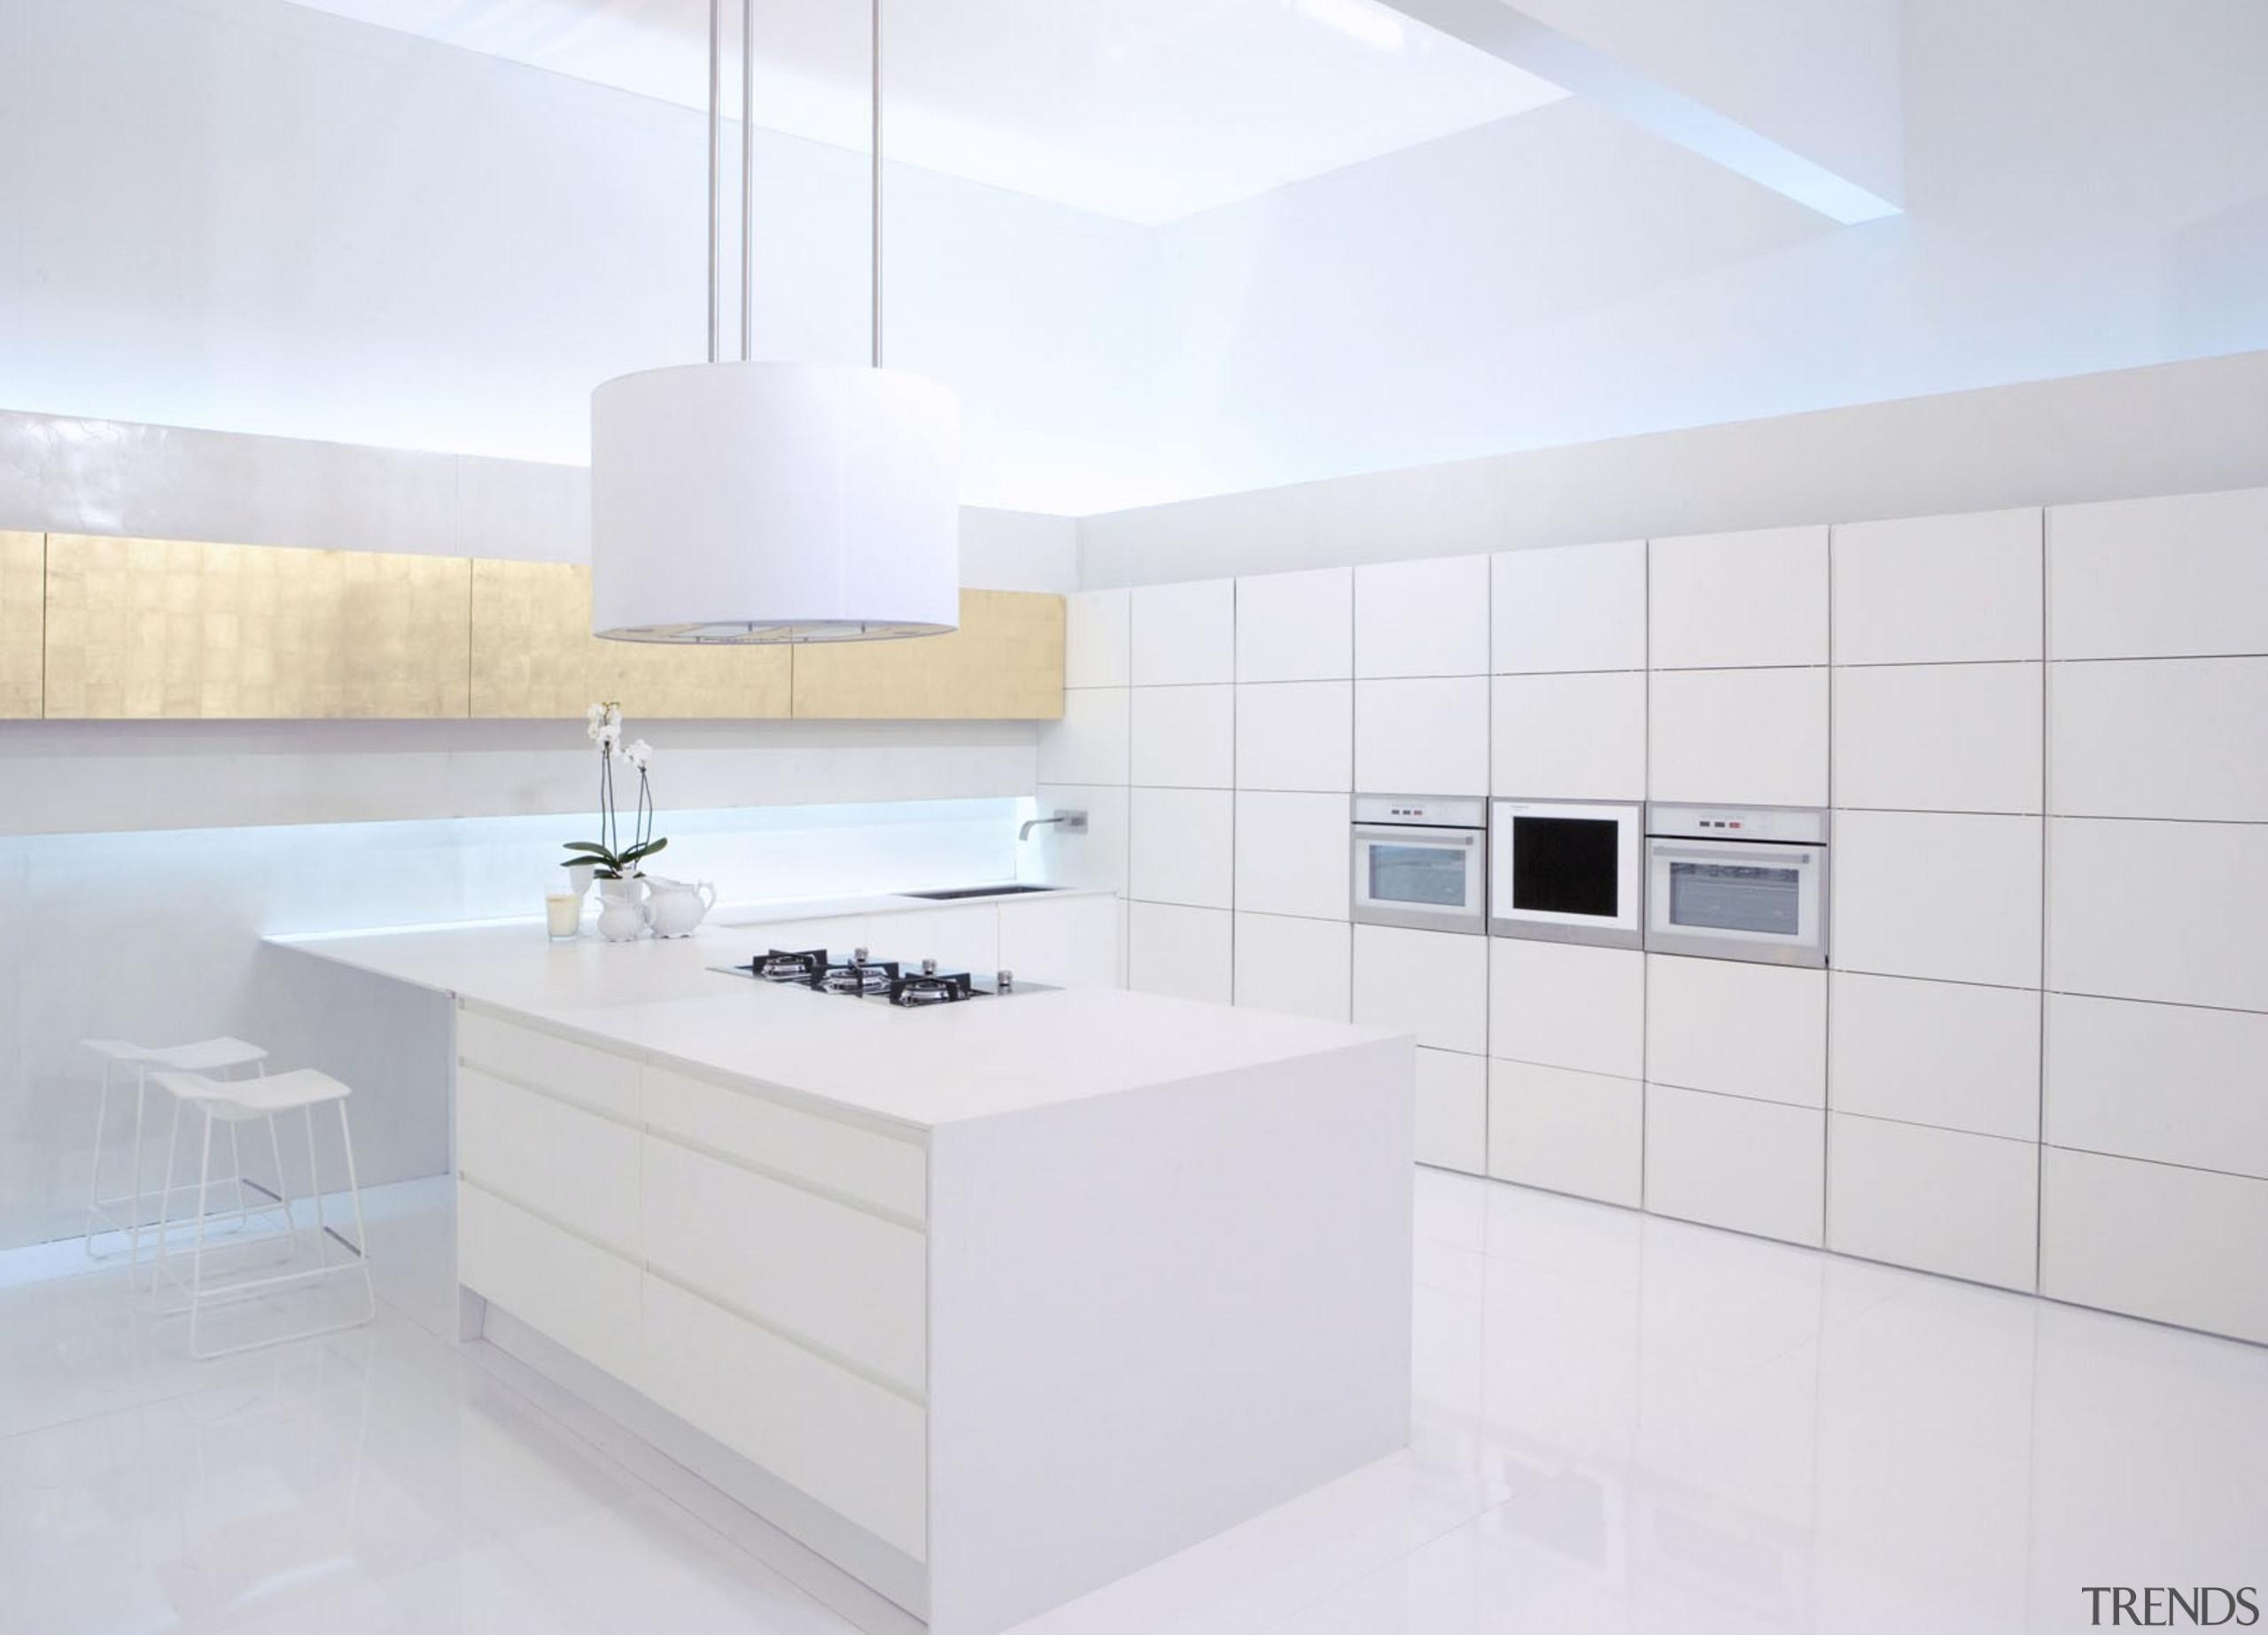 Blanco Zeus Extreme - Blanco Zeus Extreme - bathroom sink, countertop, floor, flooring, interior design, kitchen, product design, sink, tap, tile, white